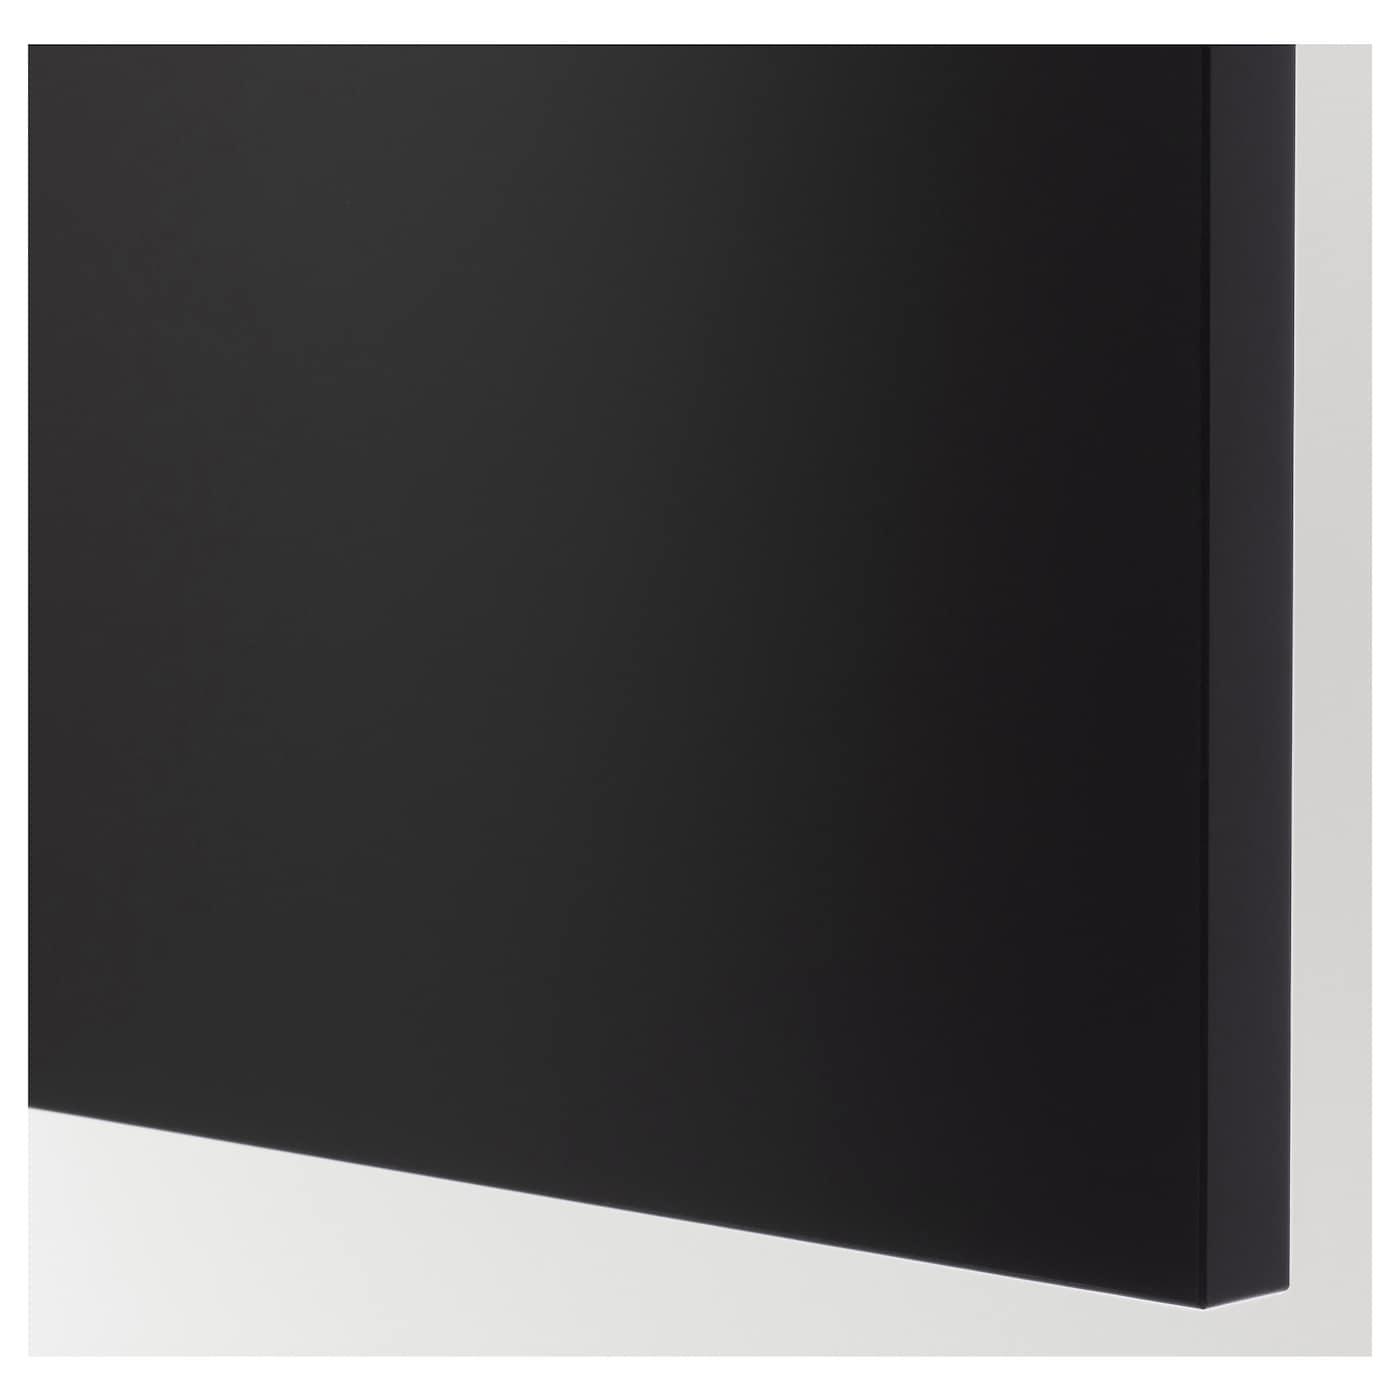 uddevalla porte surface tableau noir anthracite 60x80 cm ikea. Black Bedroom Furniture Sets. Home Design Ideas